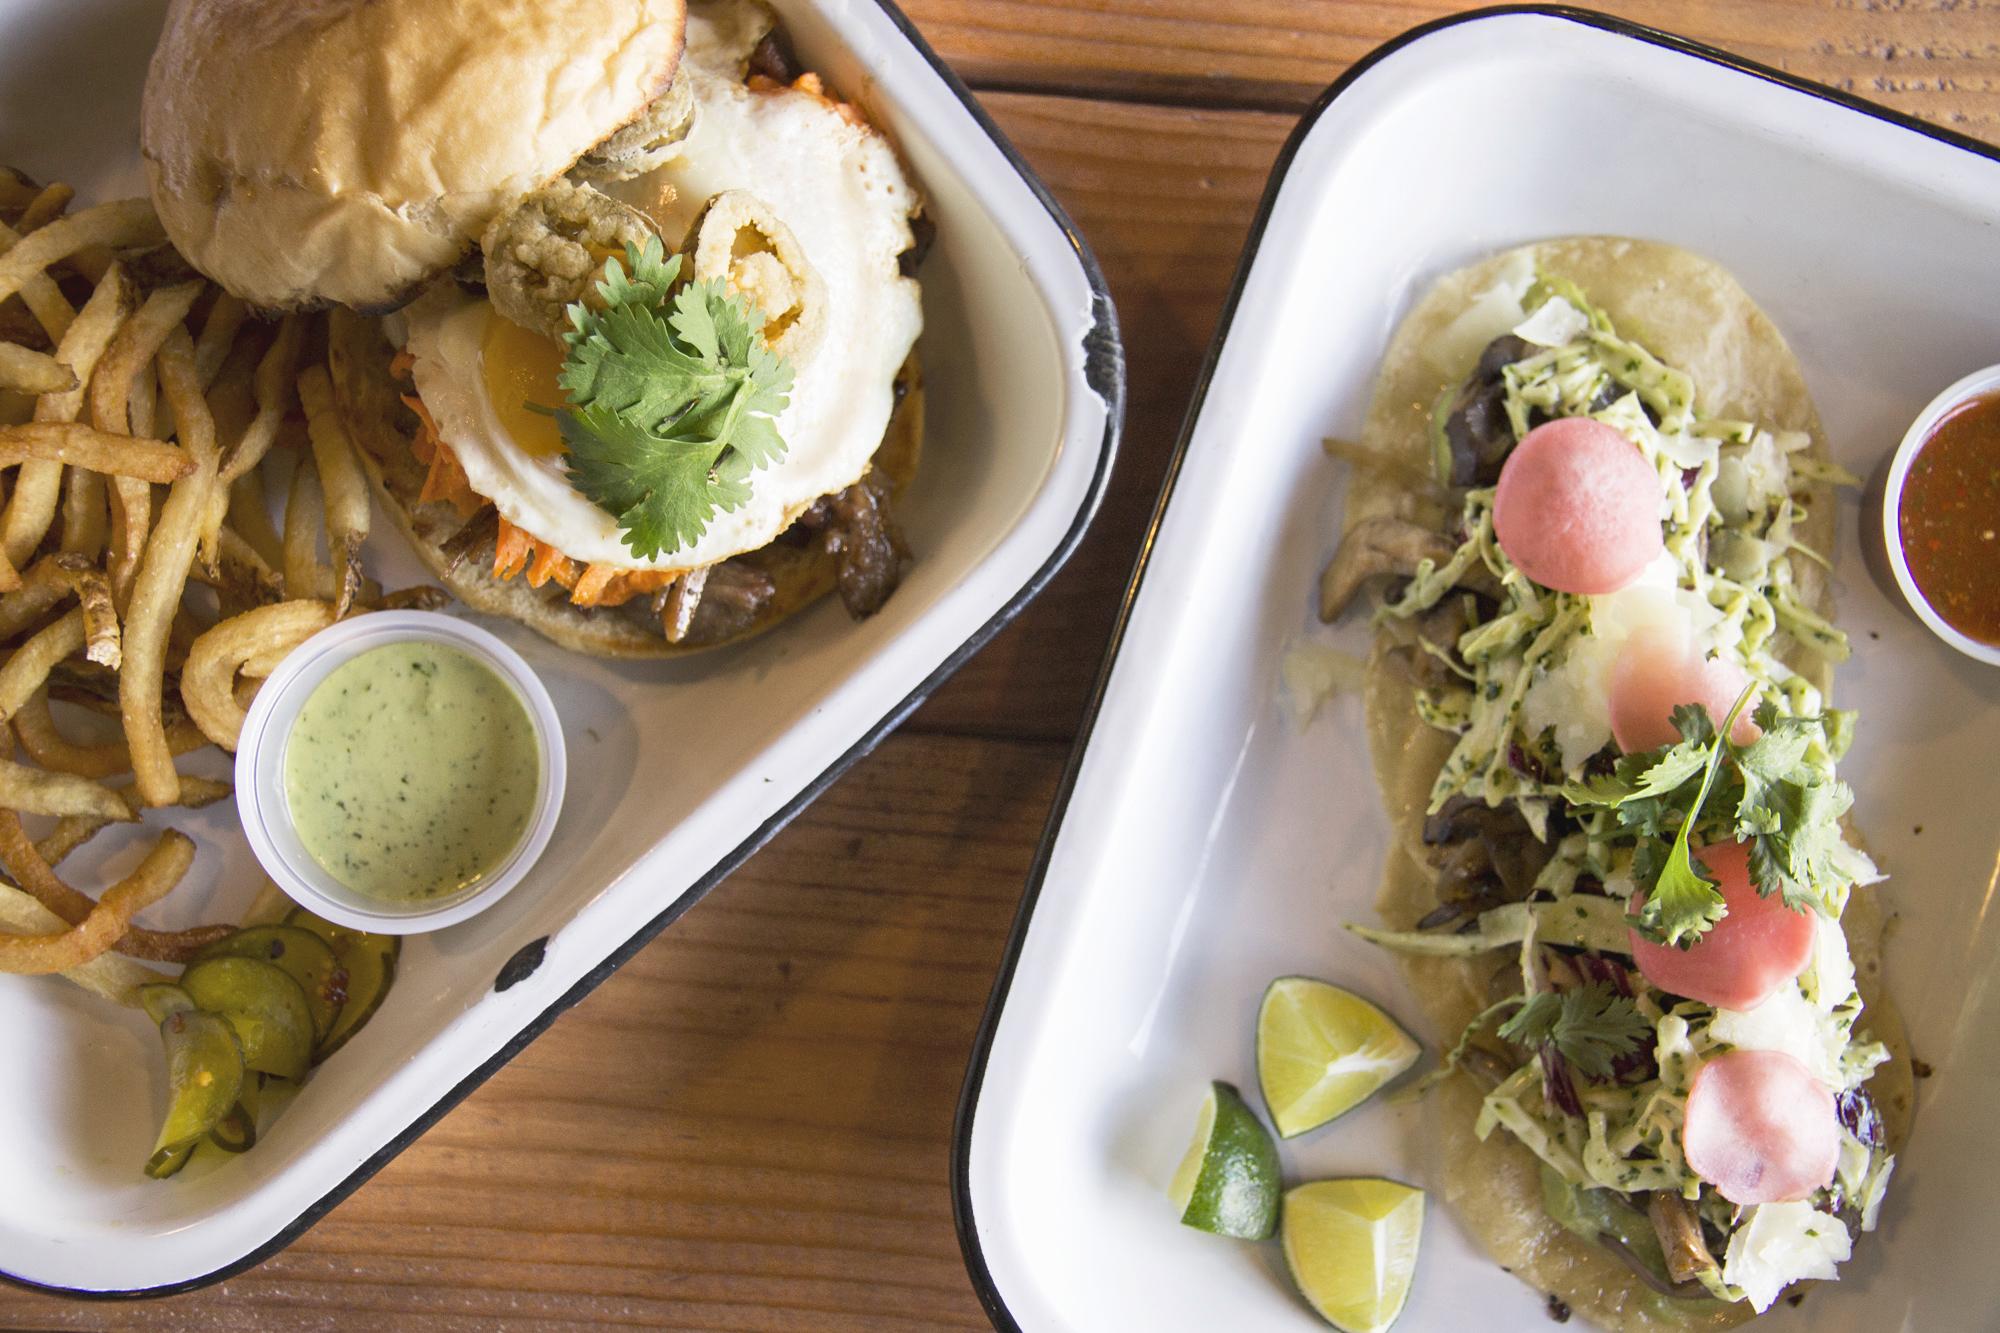 The Burger & Mushroom Tacos